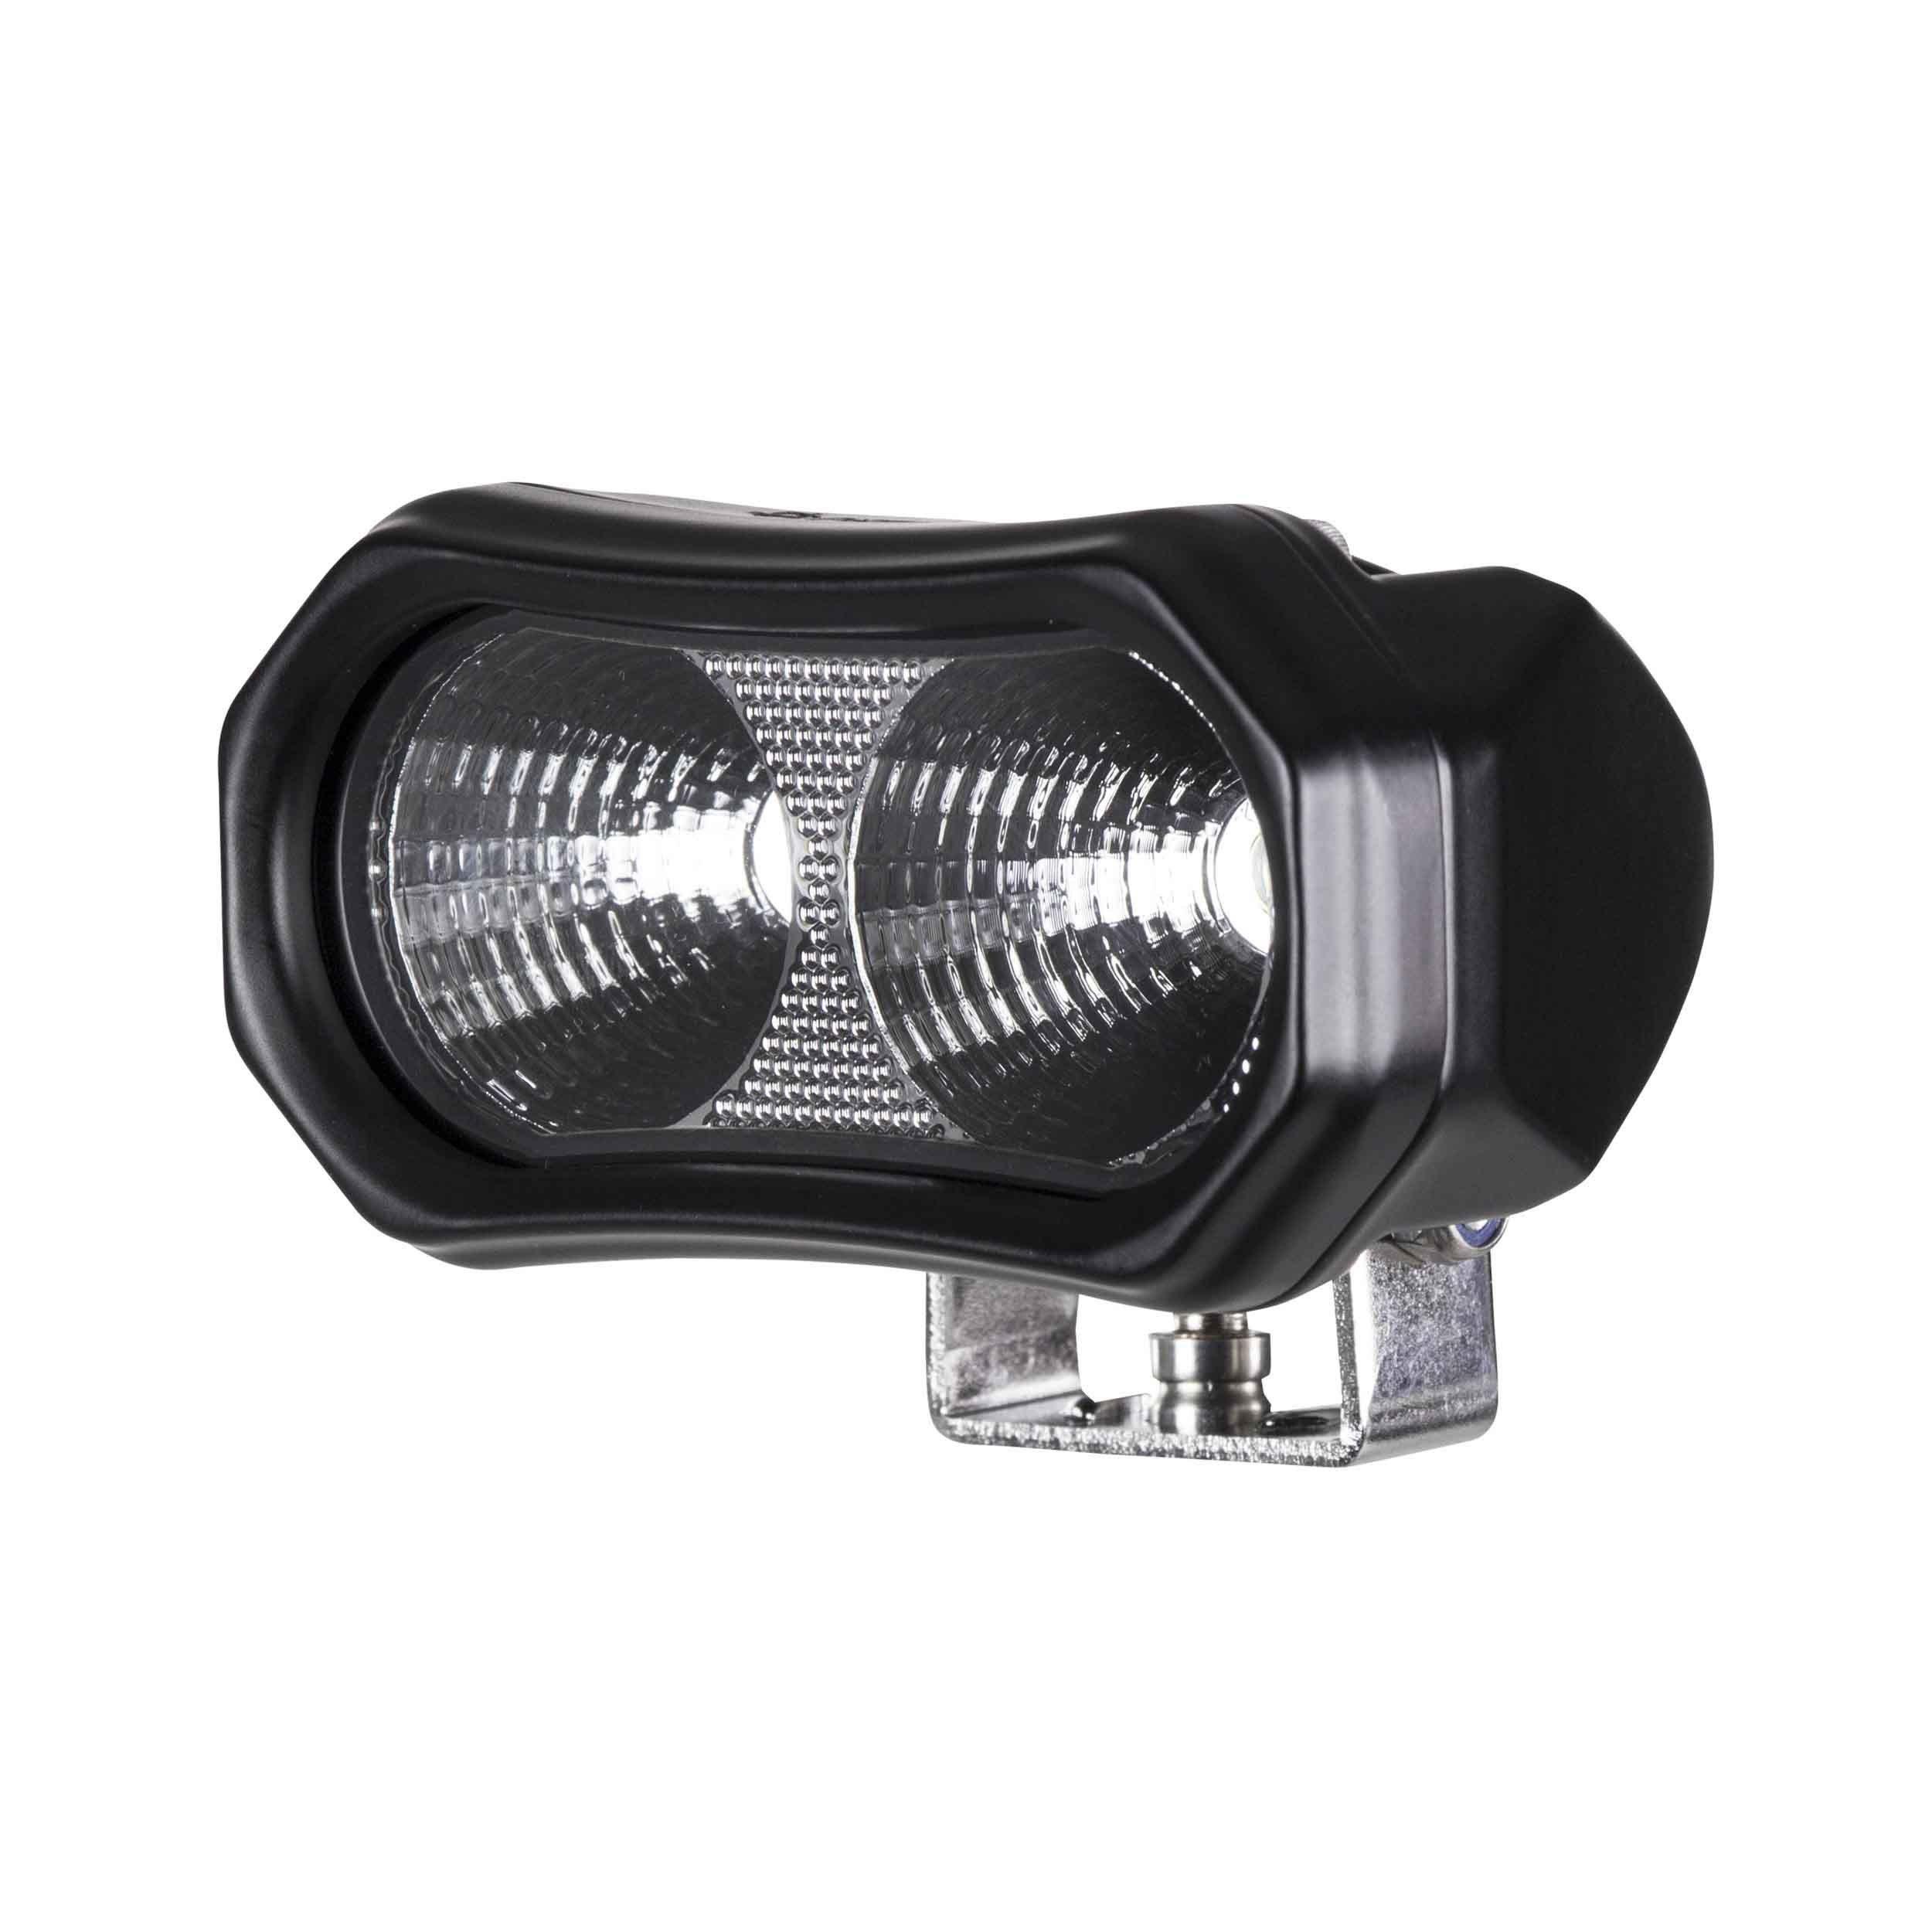 Dual LED Work Light - 3.5x2.5 Inch, 2 LED